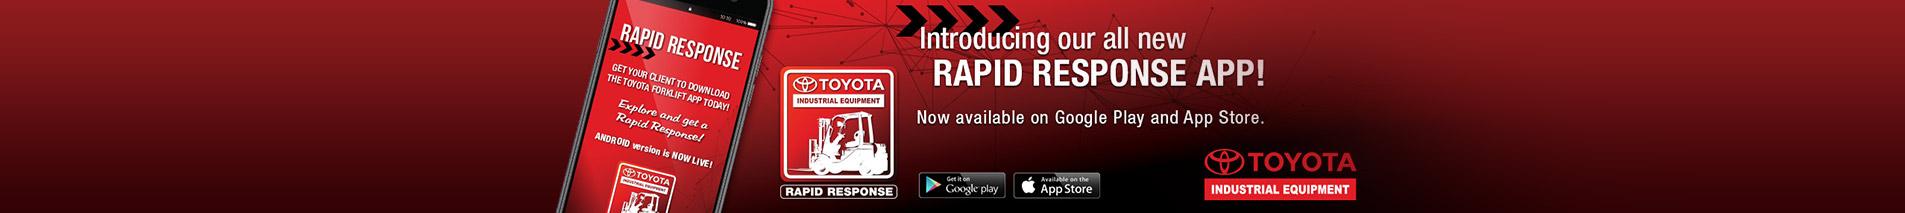 Rapid Response app